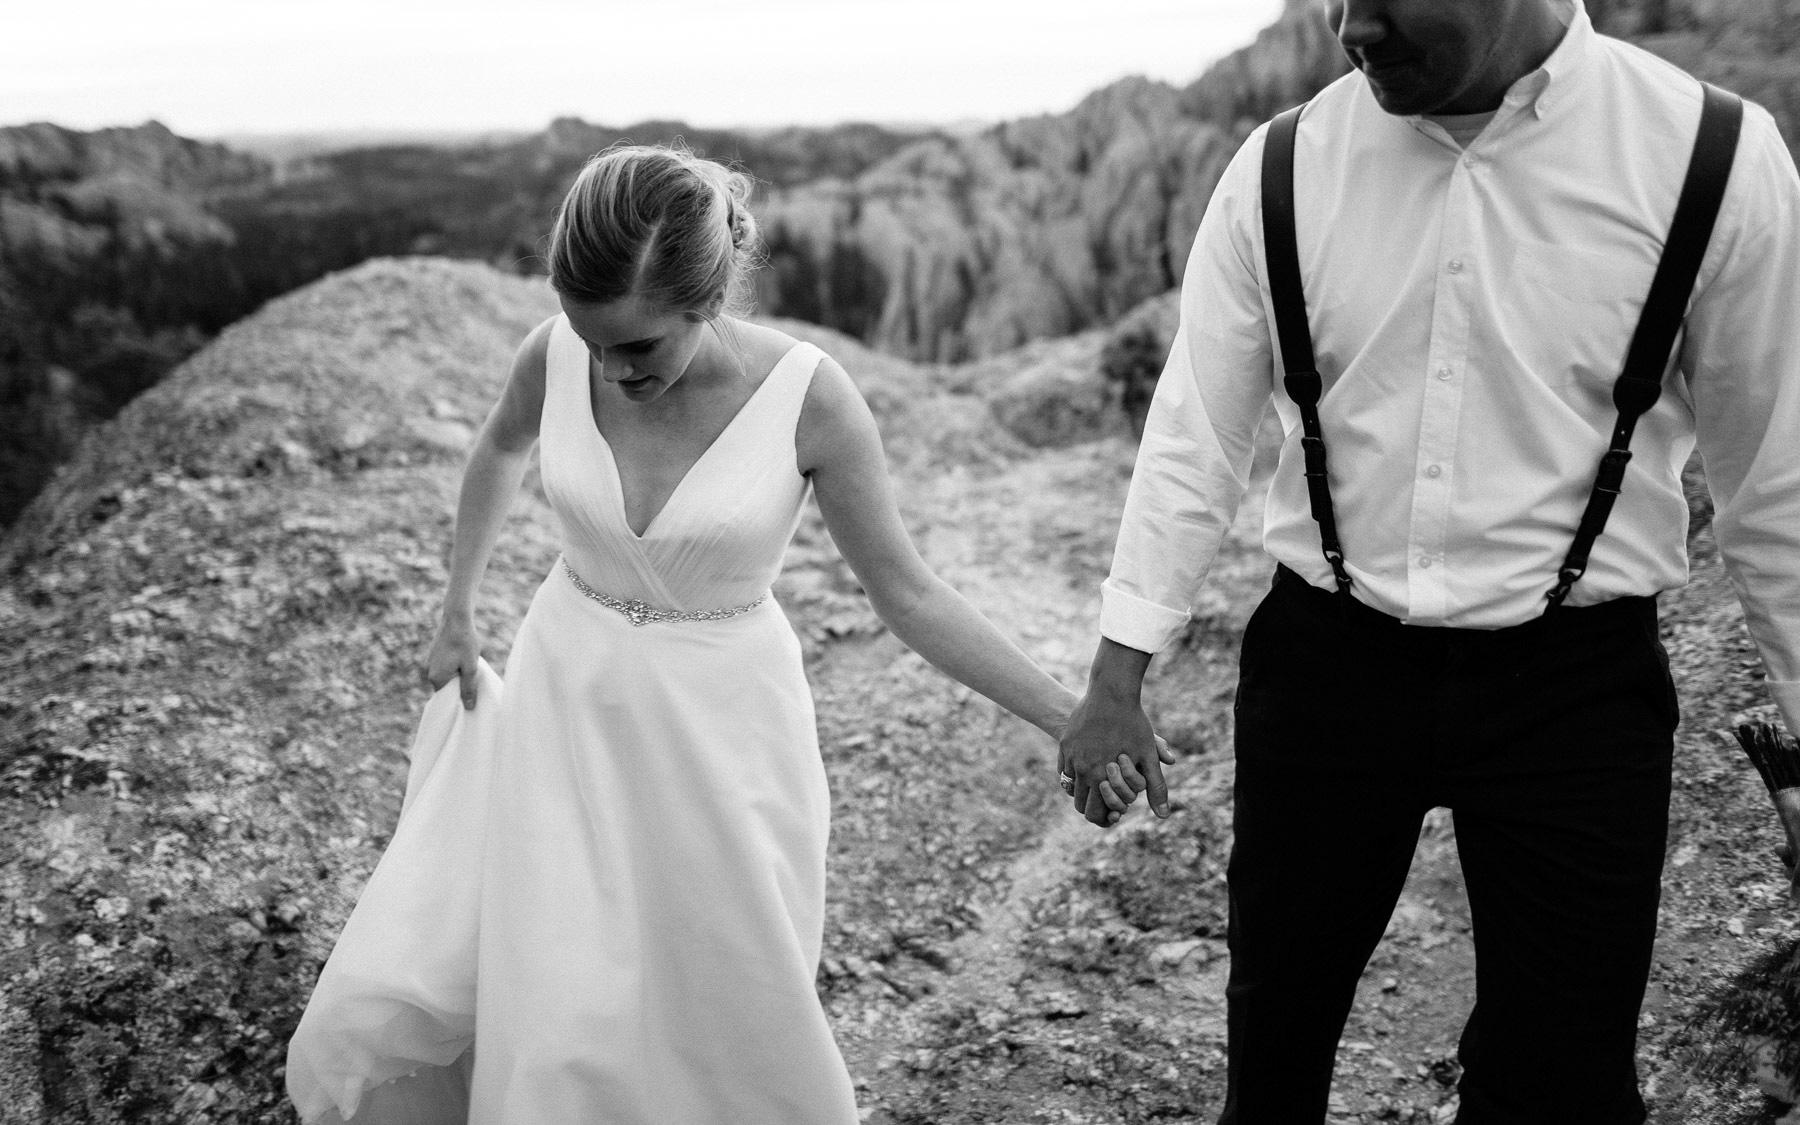 sioux-falls-black-hills-rapid-city-elopement-wedding-adventure-photographer-custer-sylvan-lake-61.jpg